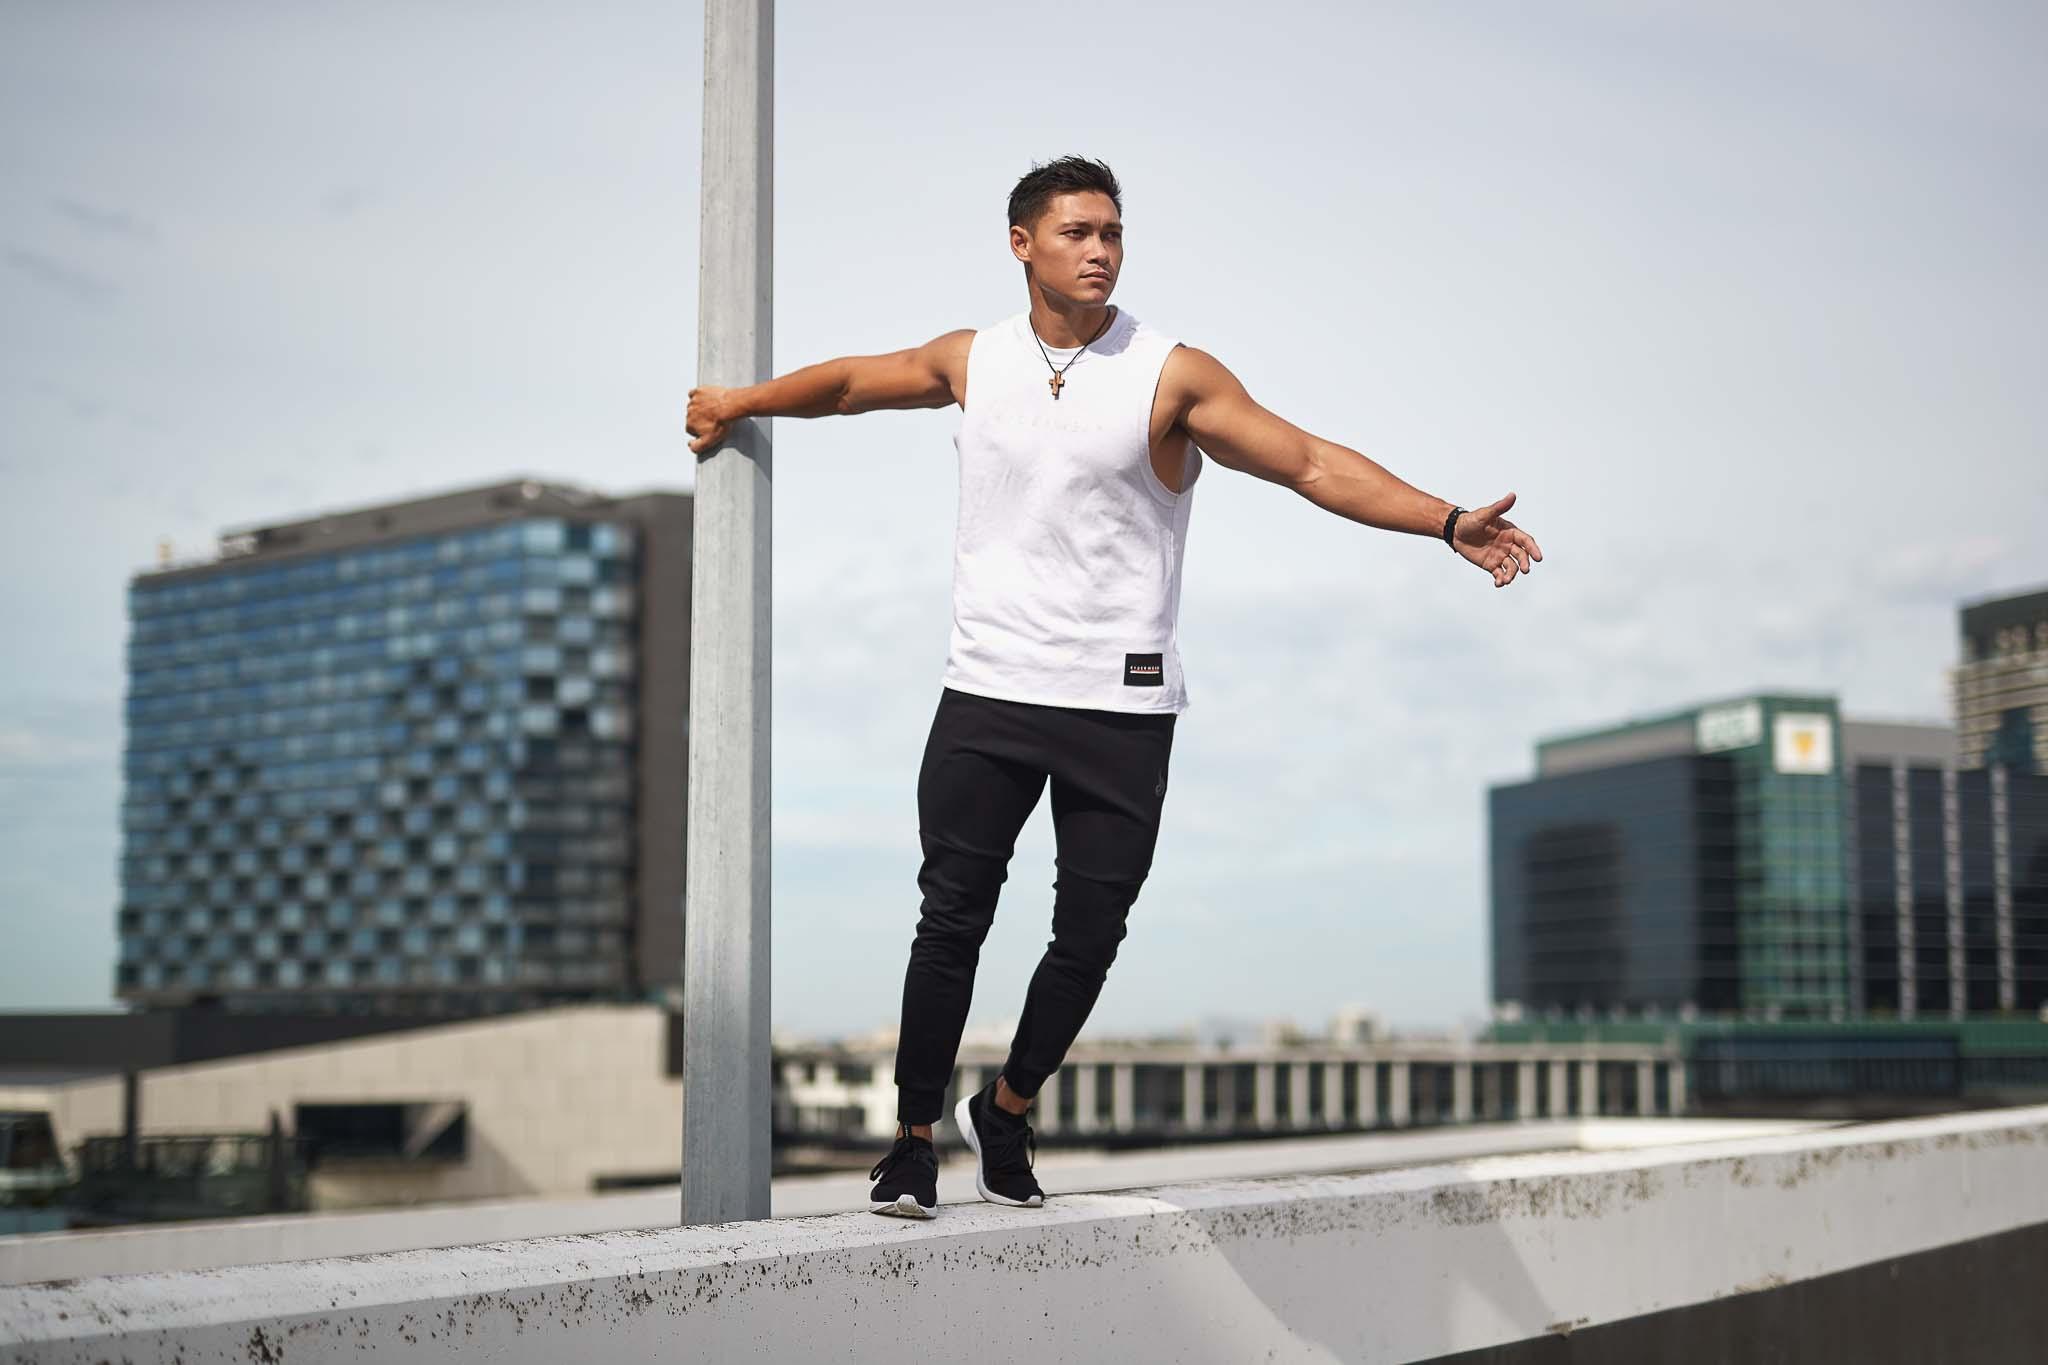 Andrew Mc standing on car park ledge holding metal pole